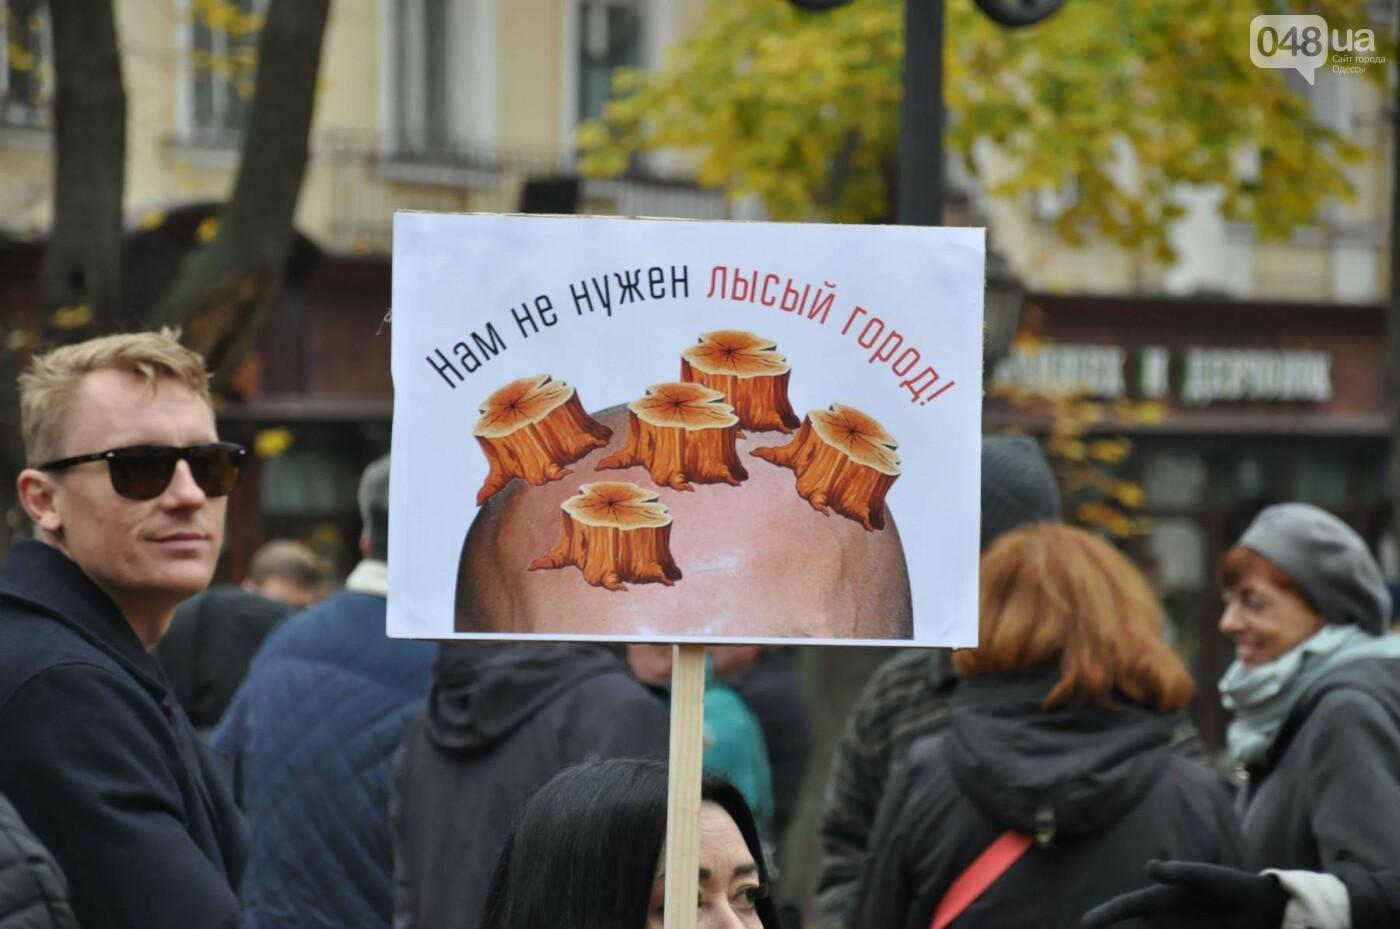 Около 5 сотен одесситов протестовали против застройки Горсада (ФОТО) , фото-6